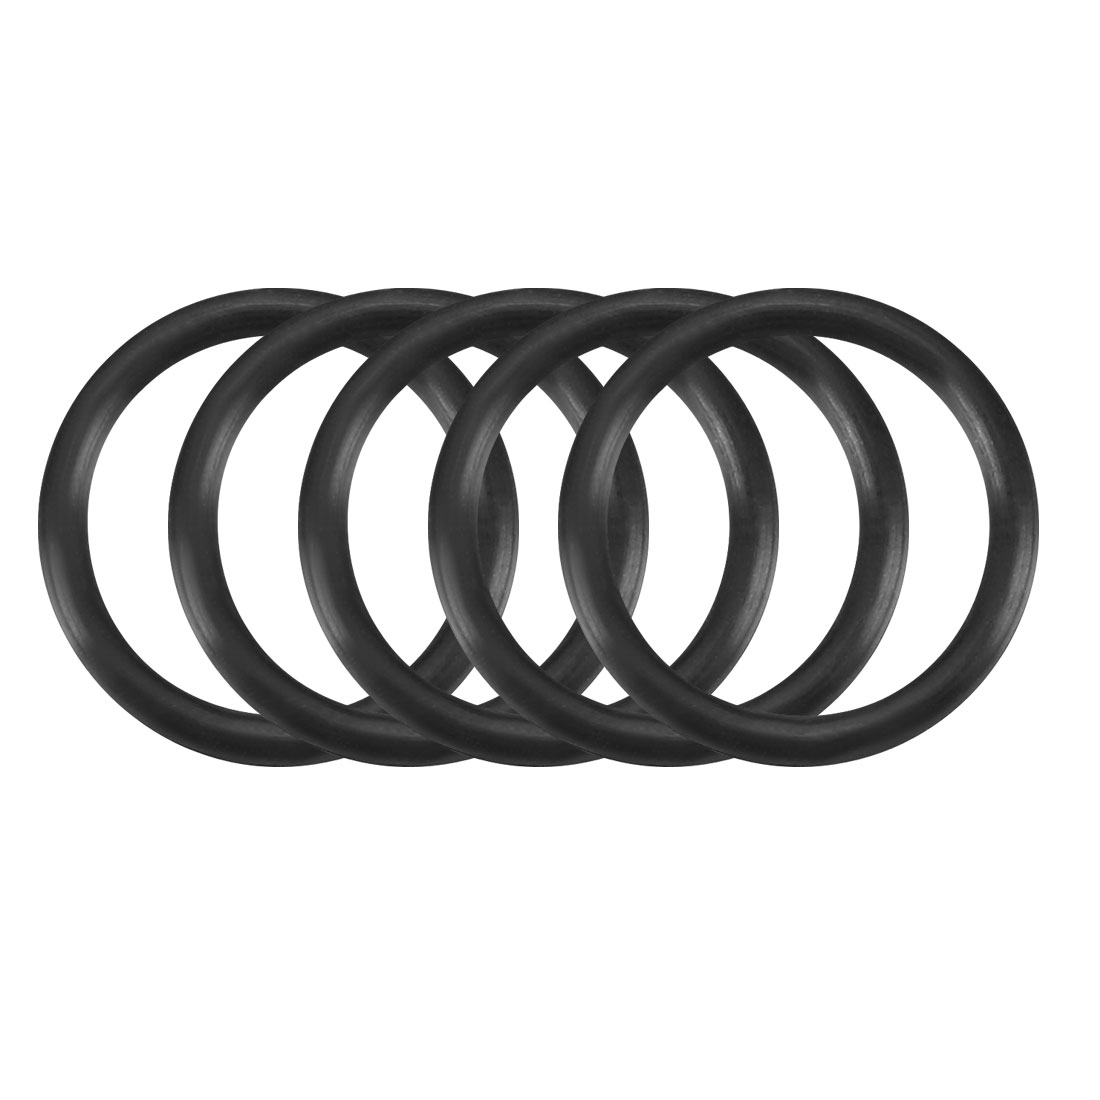 50Pcs Black 11mm x 1.2mm Nitrile Rubber O Ring NBR Oil Sealing Grommets